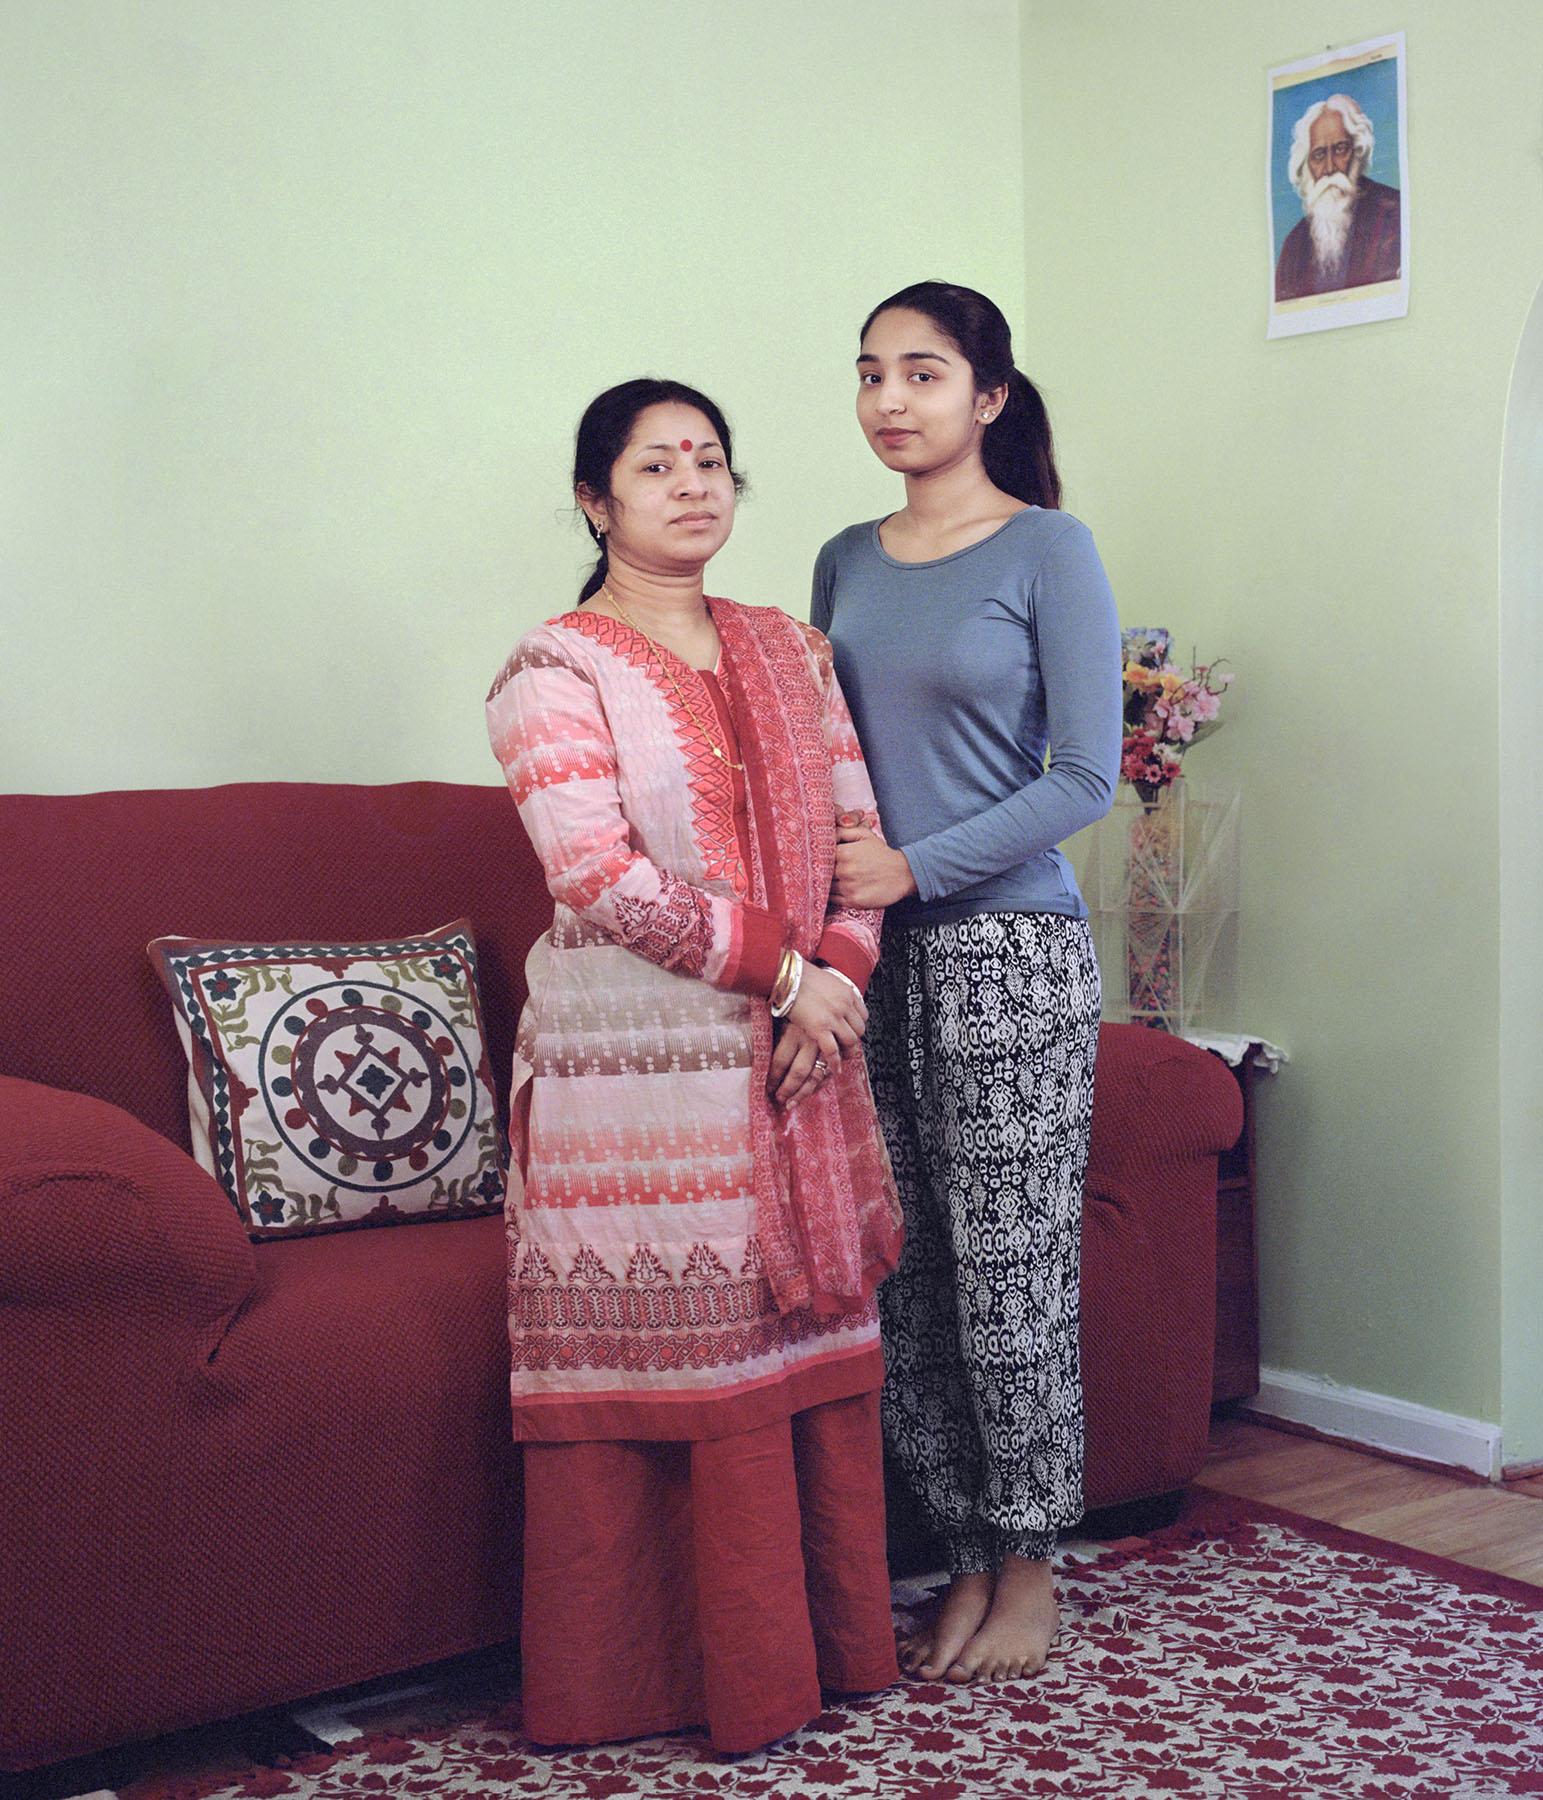 Eva_Ermert_Mothers&Daughters_Alaka&Orjita_4.jpg